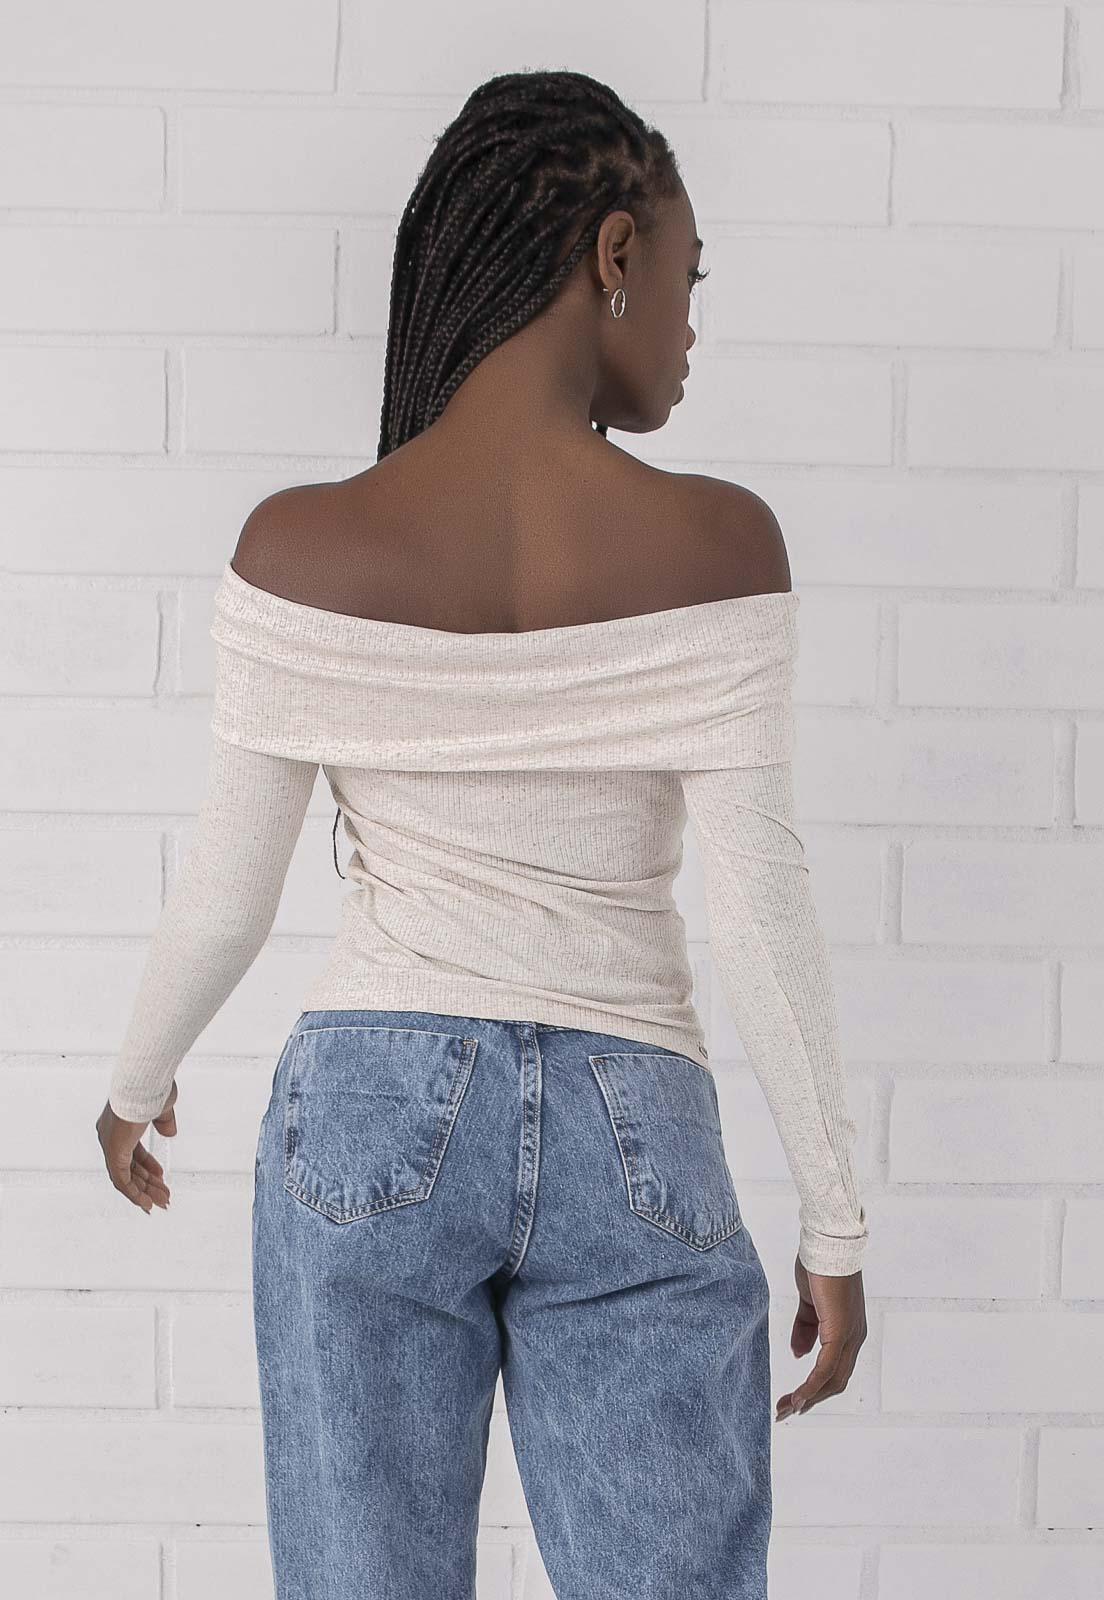 Blusa Decote Ombro a Ombro Bege Pkd